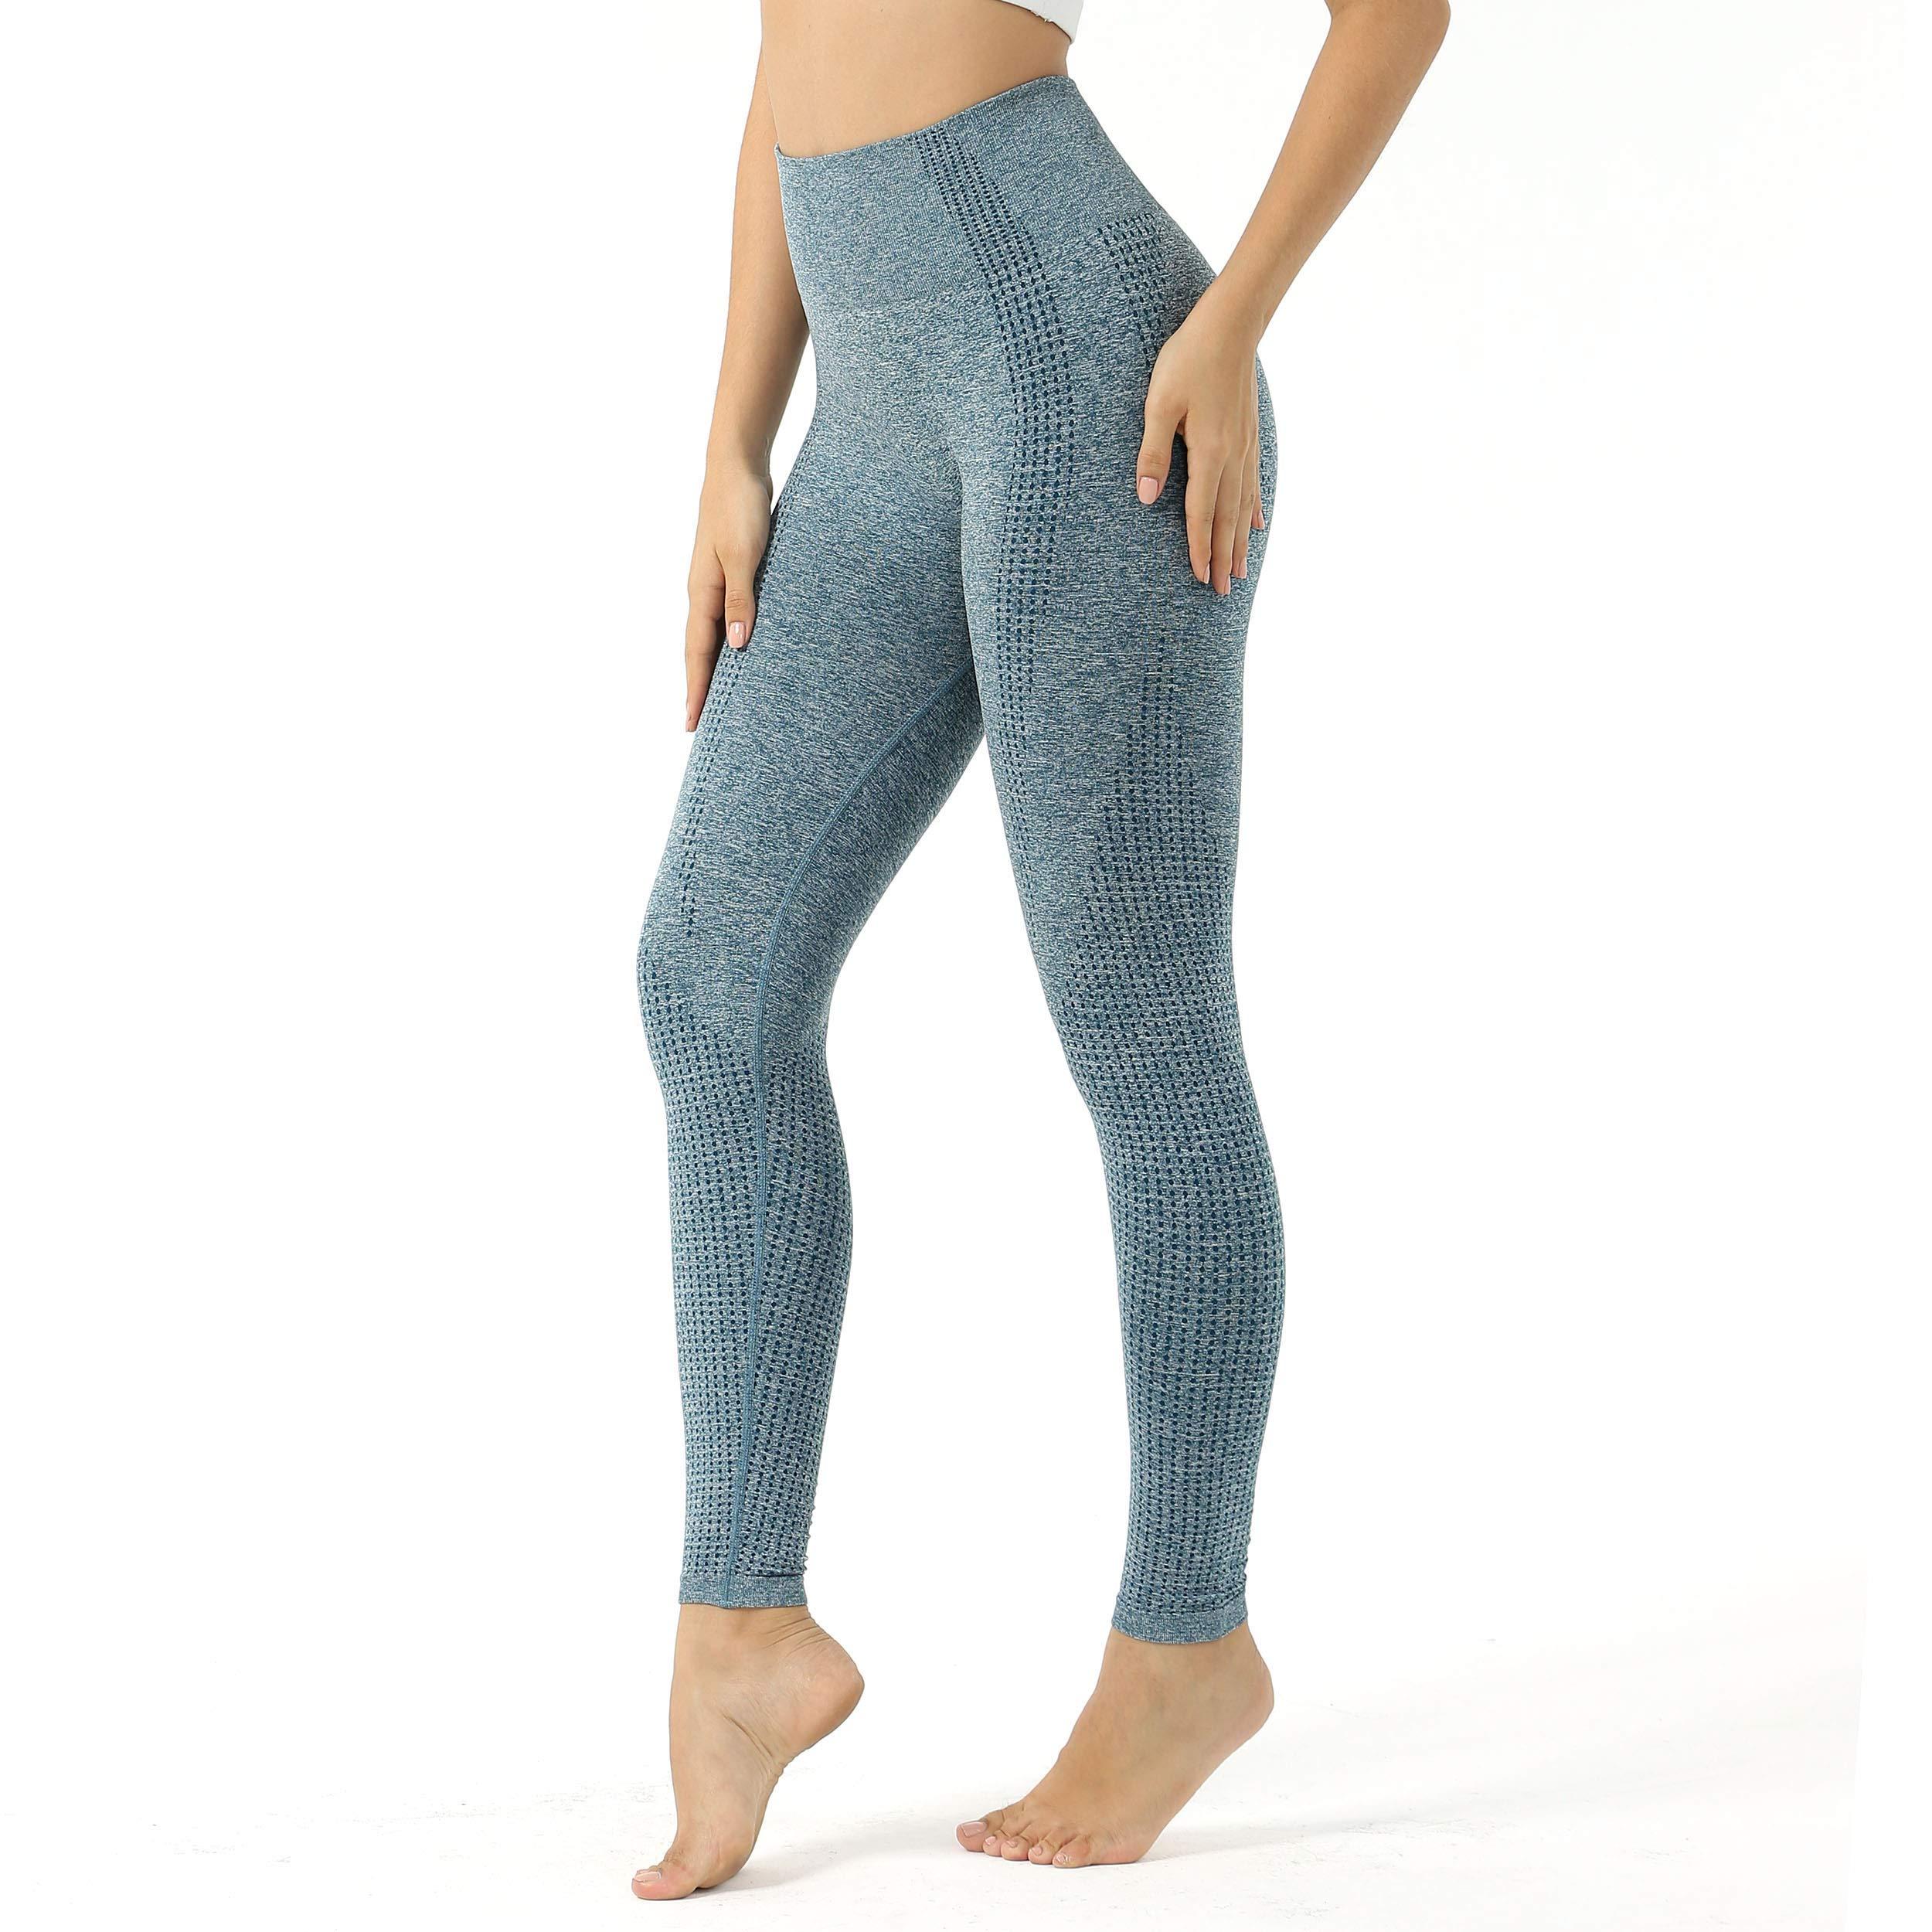 Aoxjox Women's High Waist Workout Gym Vital Seamless Leggings Yoga Pants (Marine Blue Marl, Small)